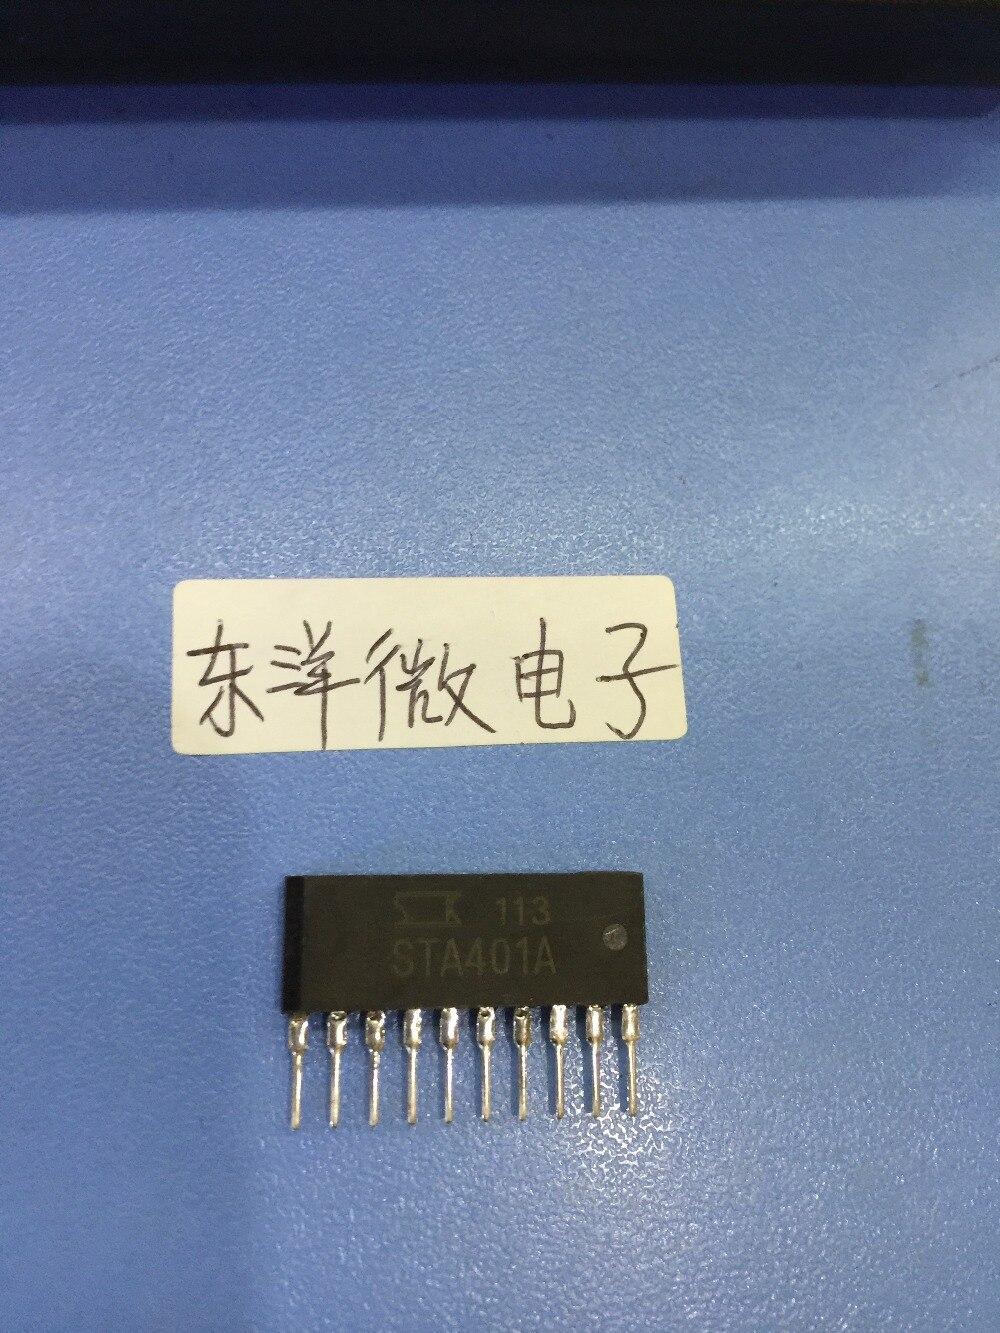 5PCS STA401A ZIP10 100% original Novo